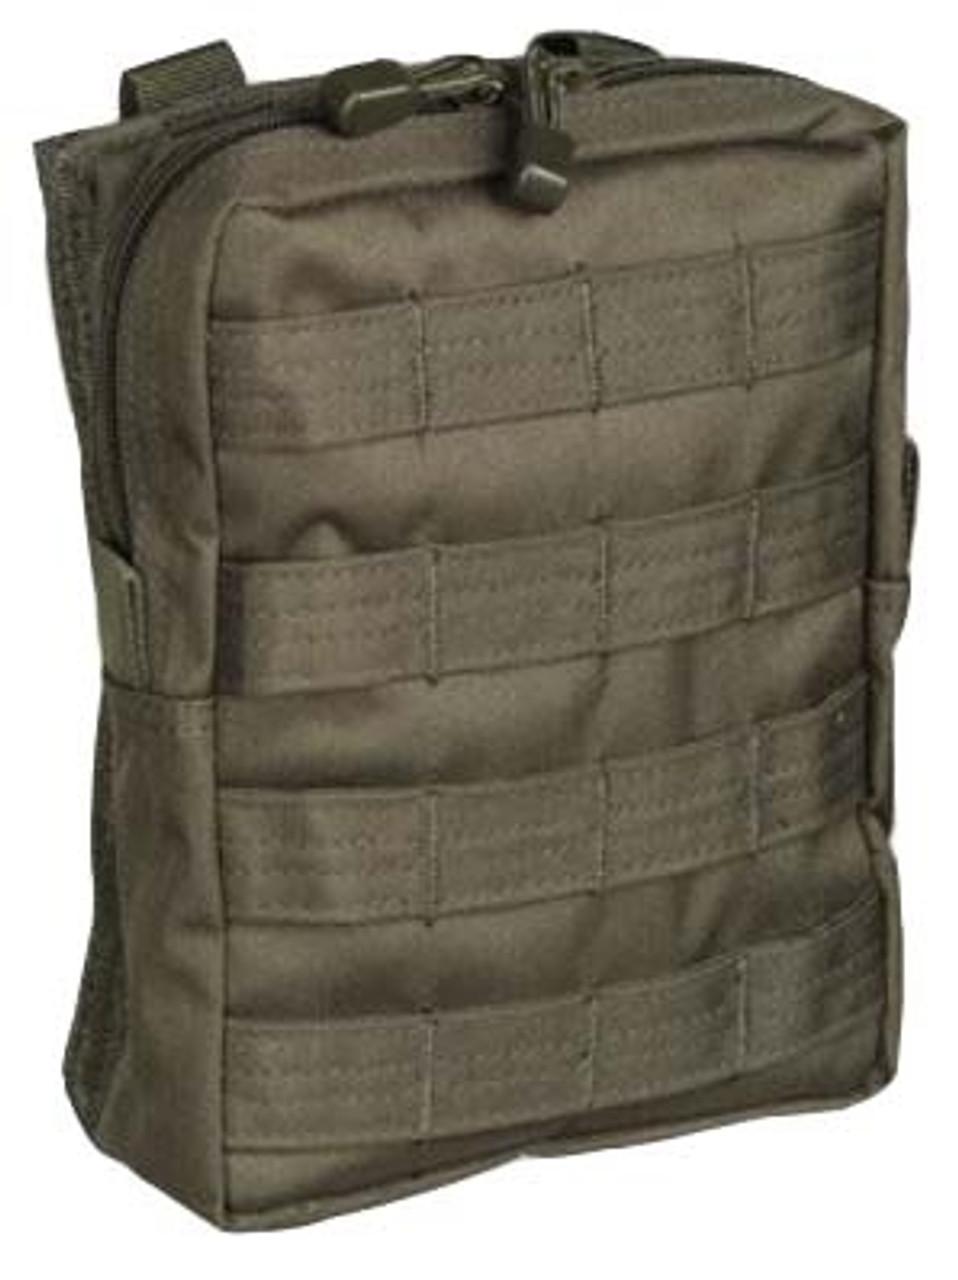 Military Trauma Kit